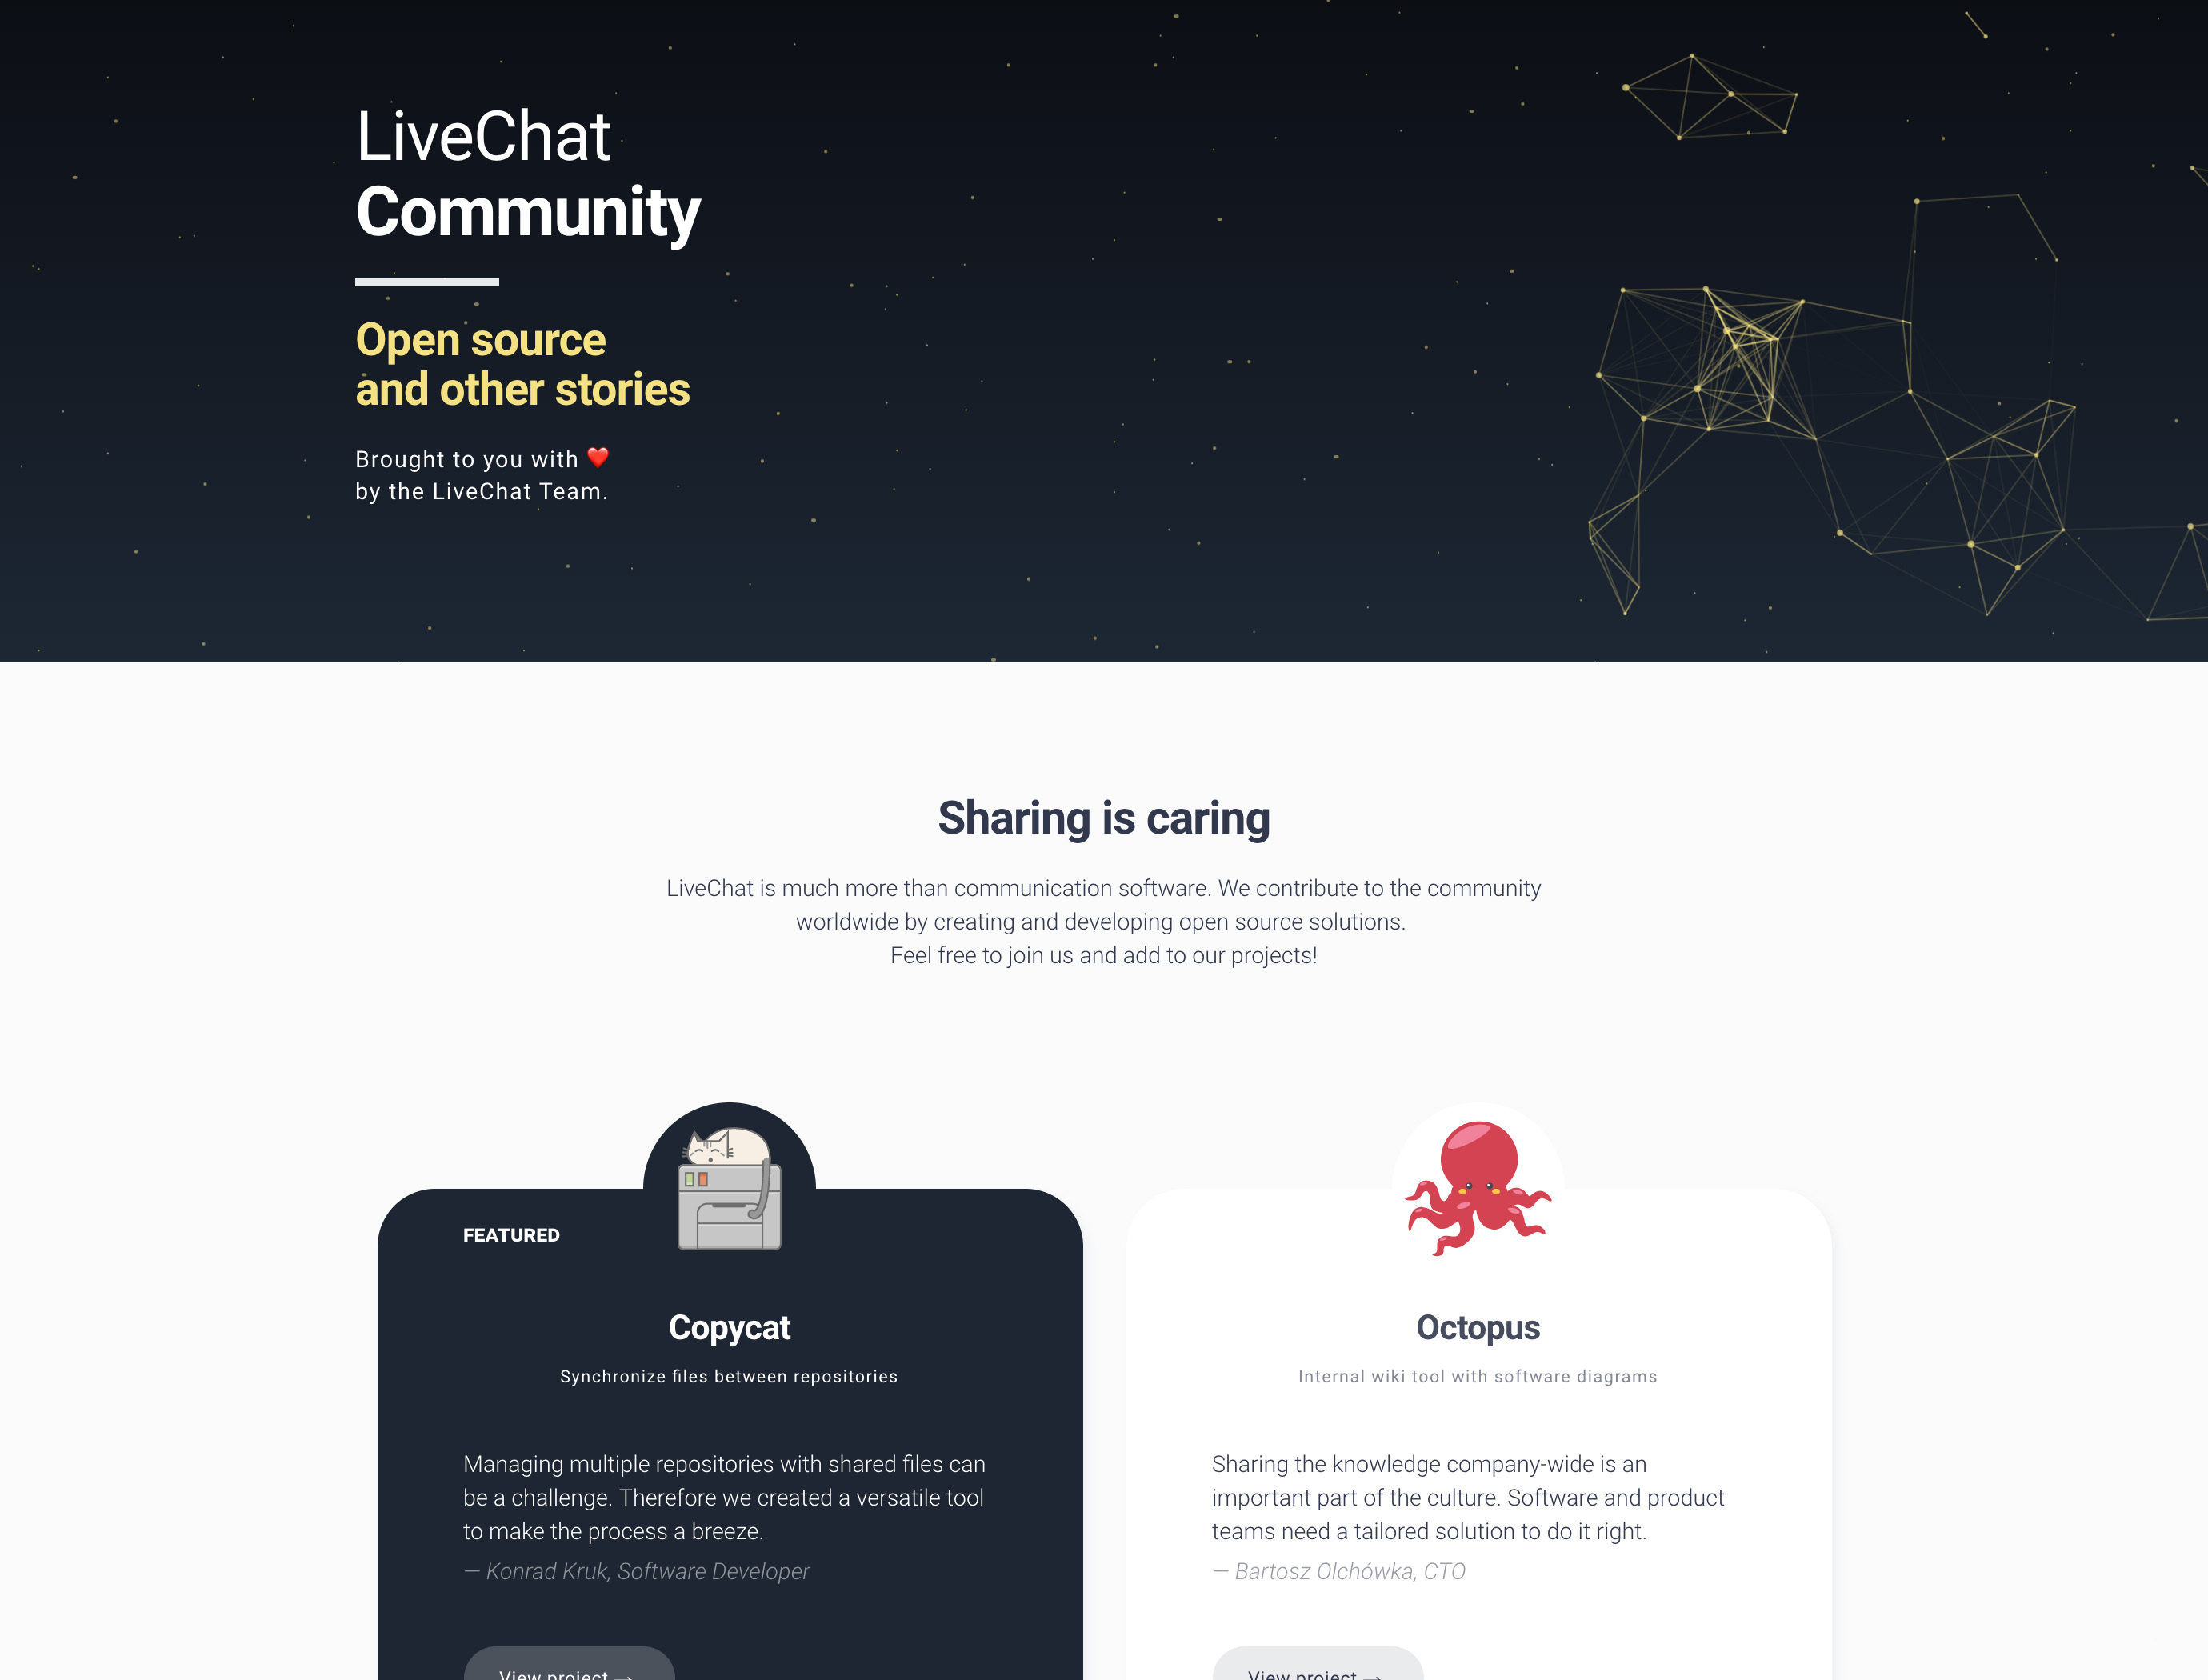 LiveChat Community